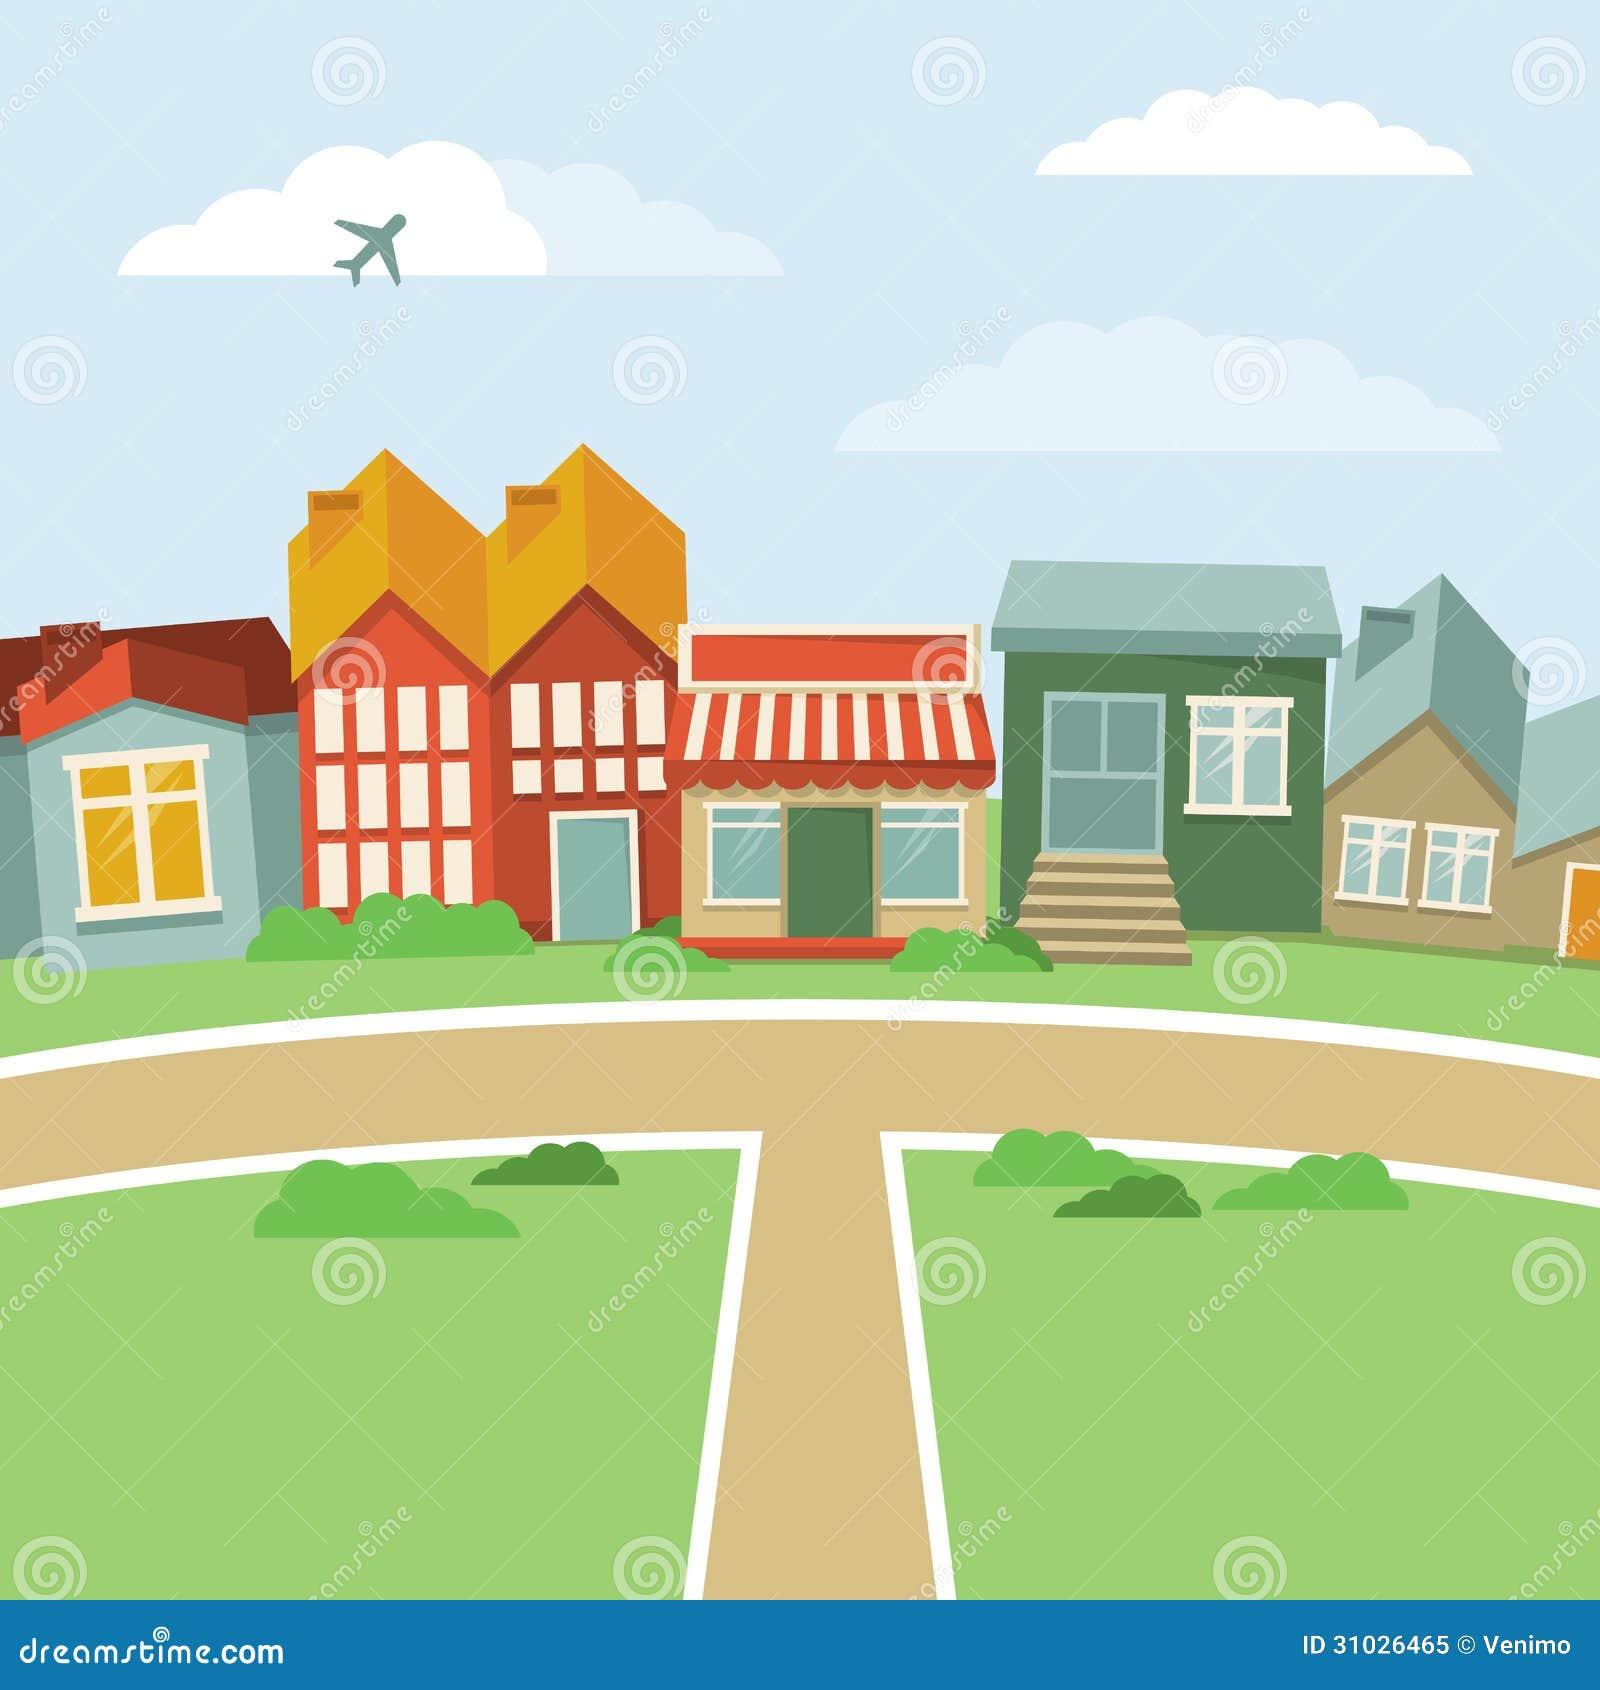 Town Landscape Vector Illustration: Vector Cartoon Town Stock Vector. Illustration Of City